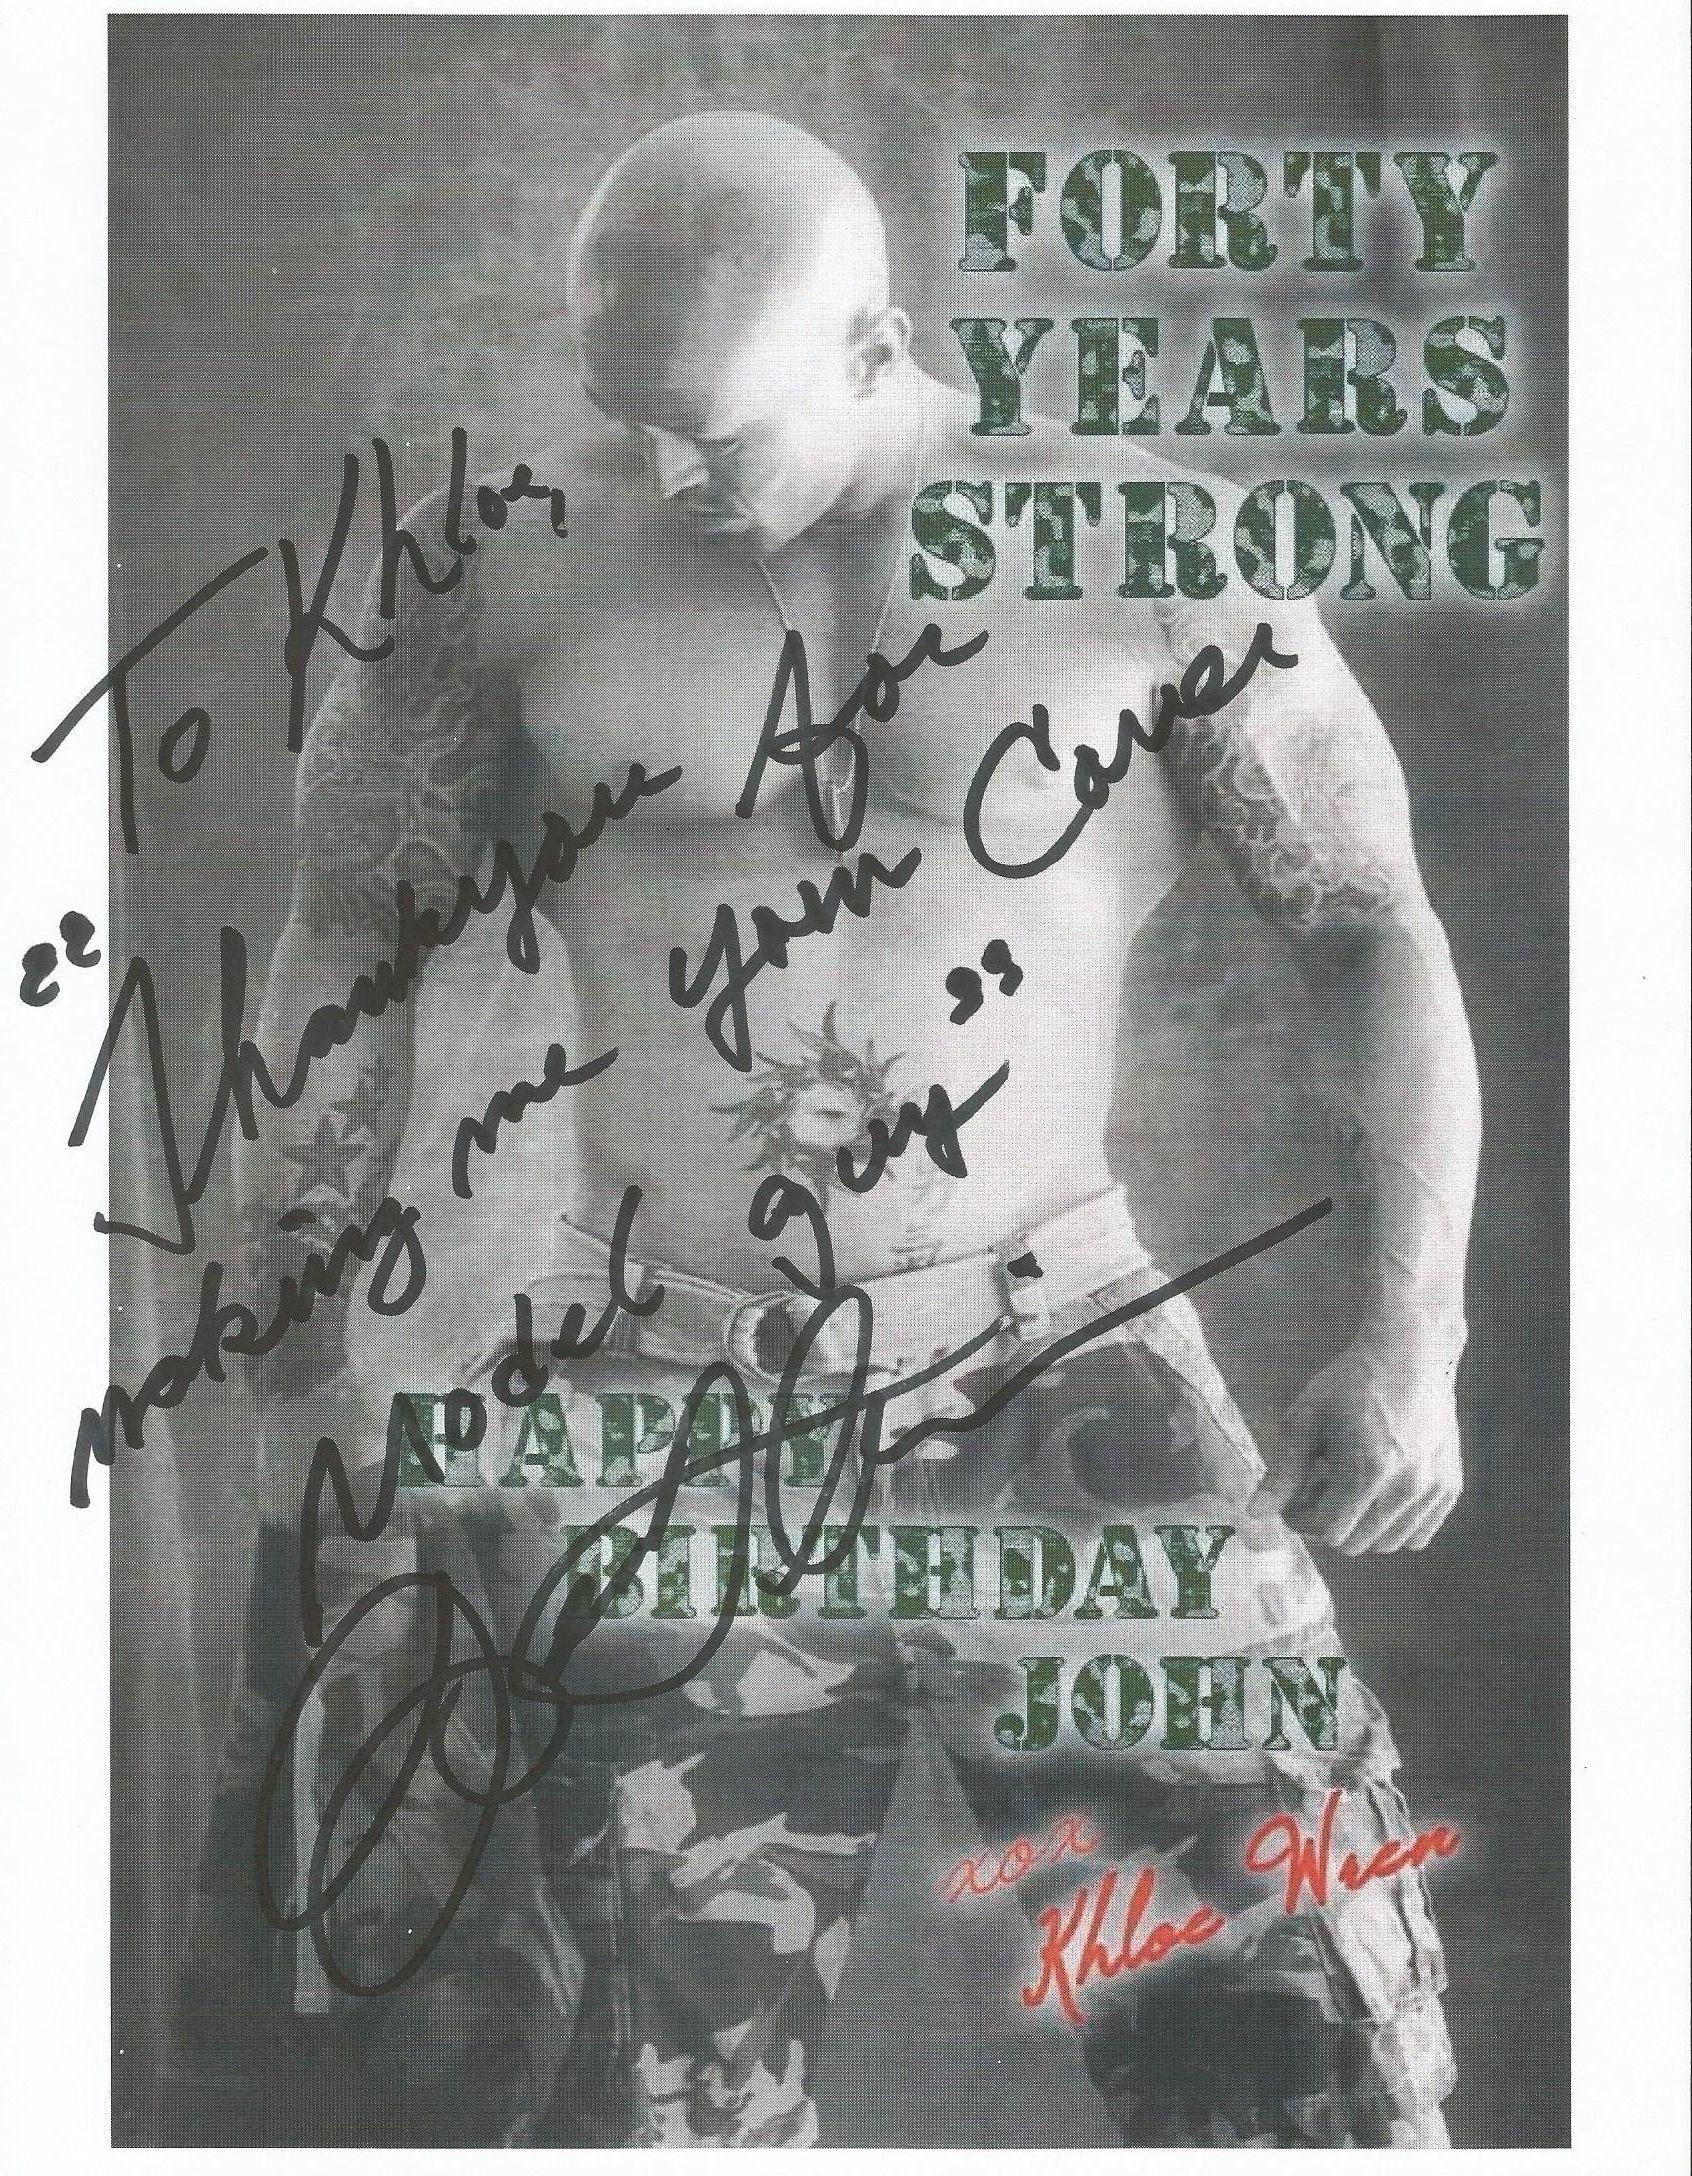 Cover Model John Quinlan Happy Birthday Khloe Wren Autograph Signed 8x10